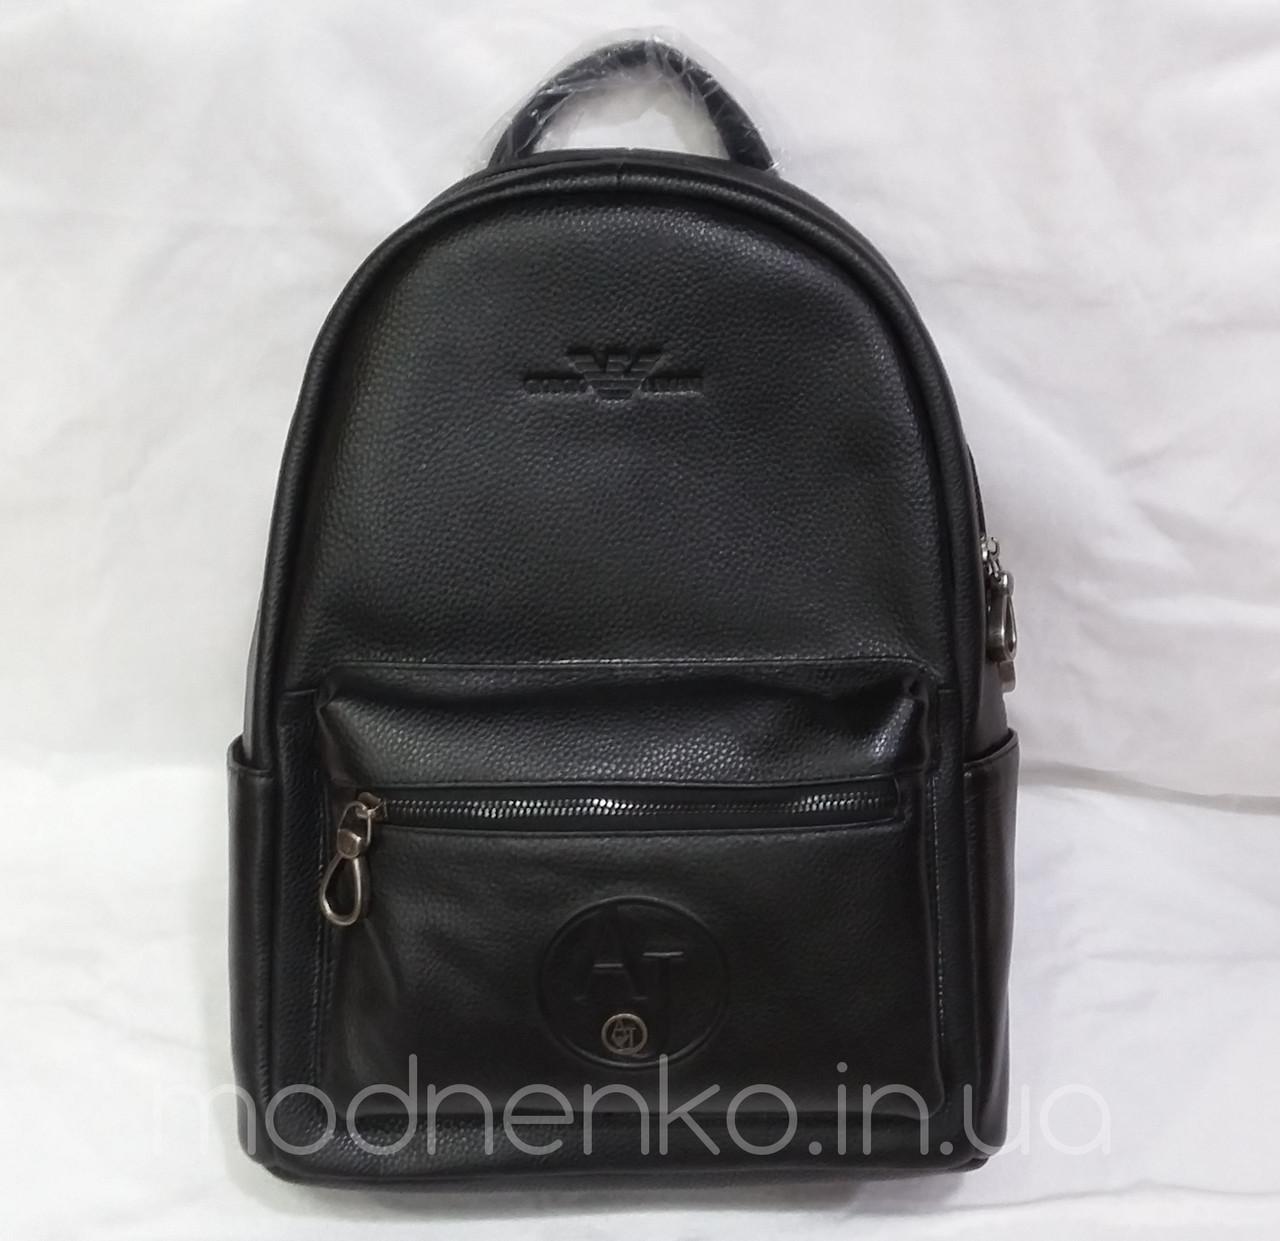 9febda47c75f Рюкзак Giorgio Armani унисекс (натуральная кожа): продажа, цена в ...